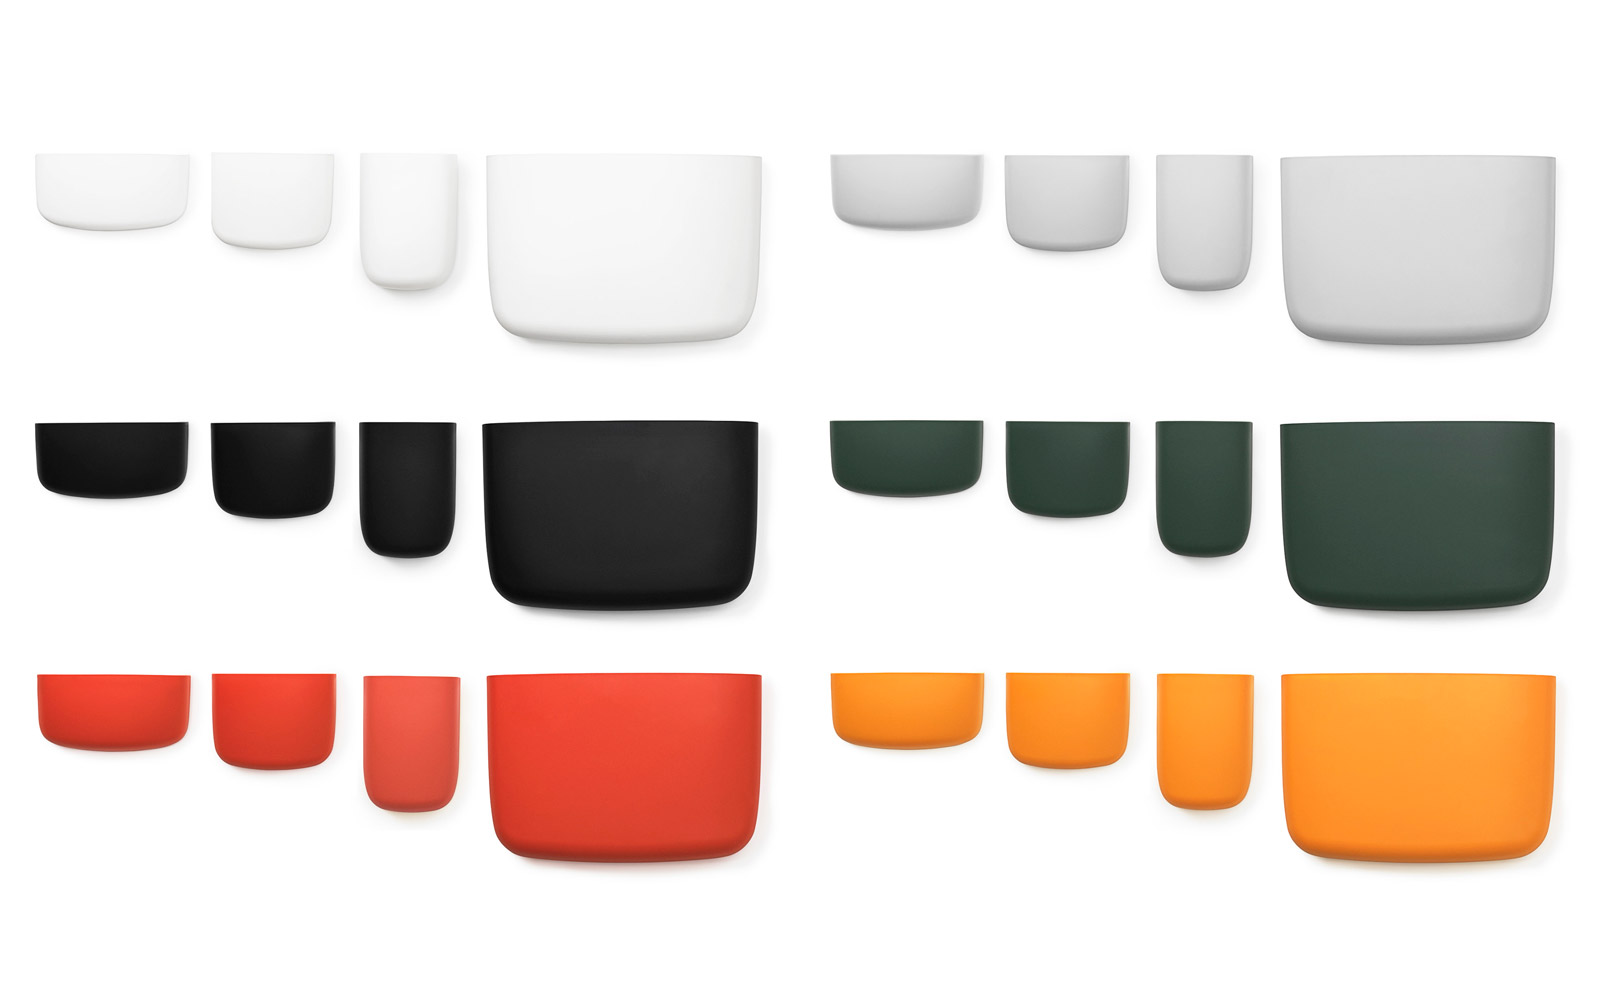 Pocket organizer storage for smaller items scandinavian design